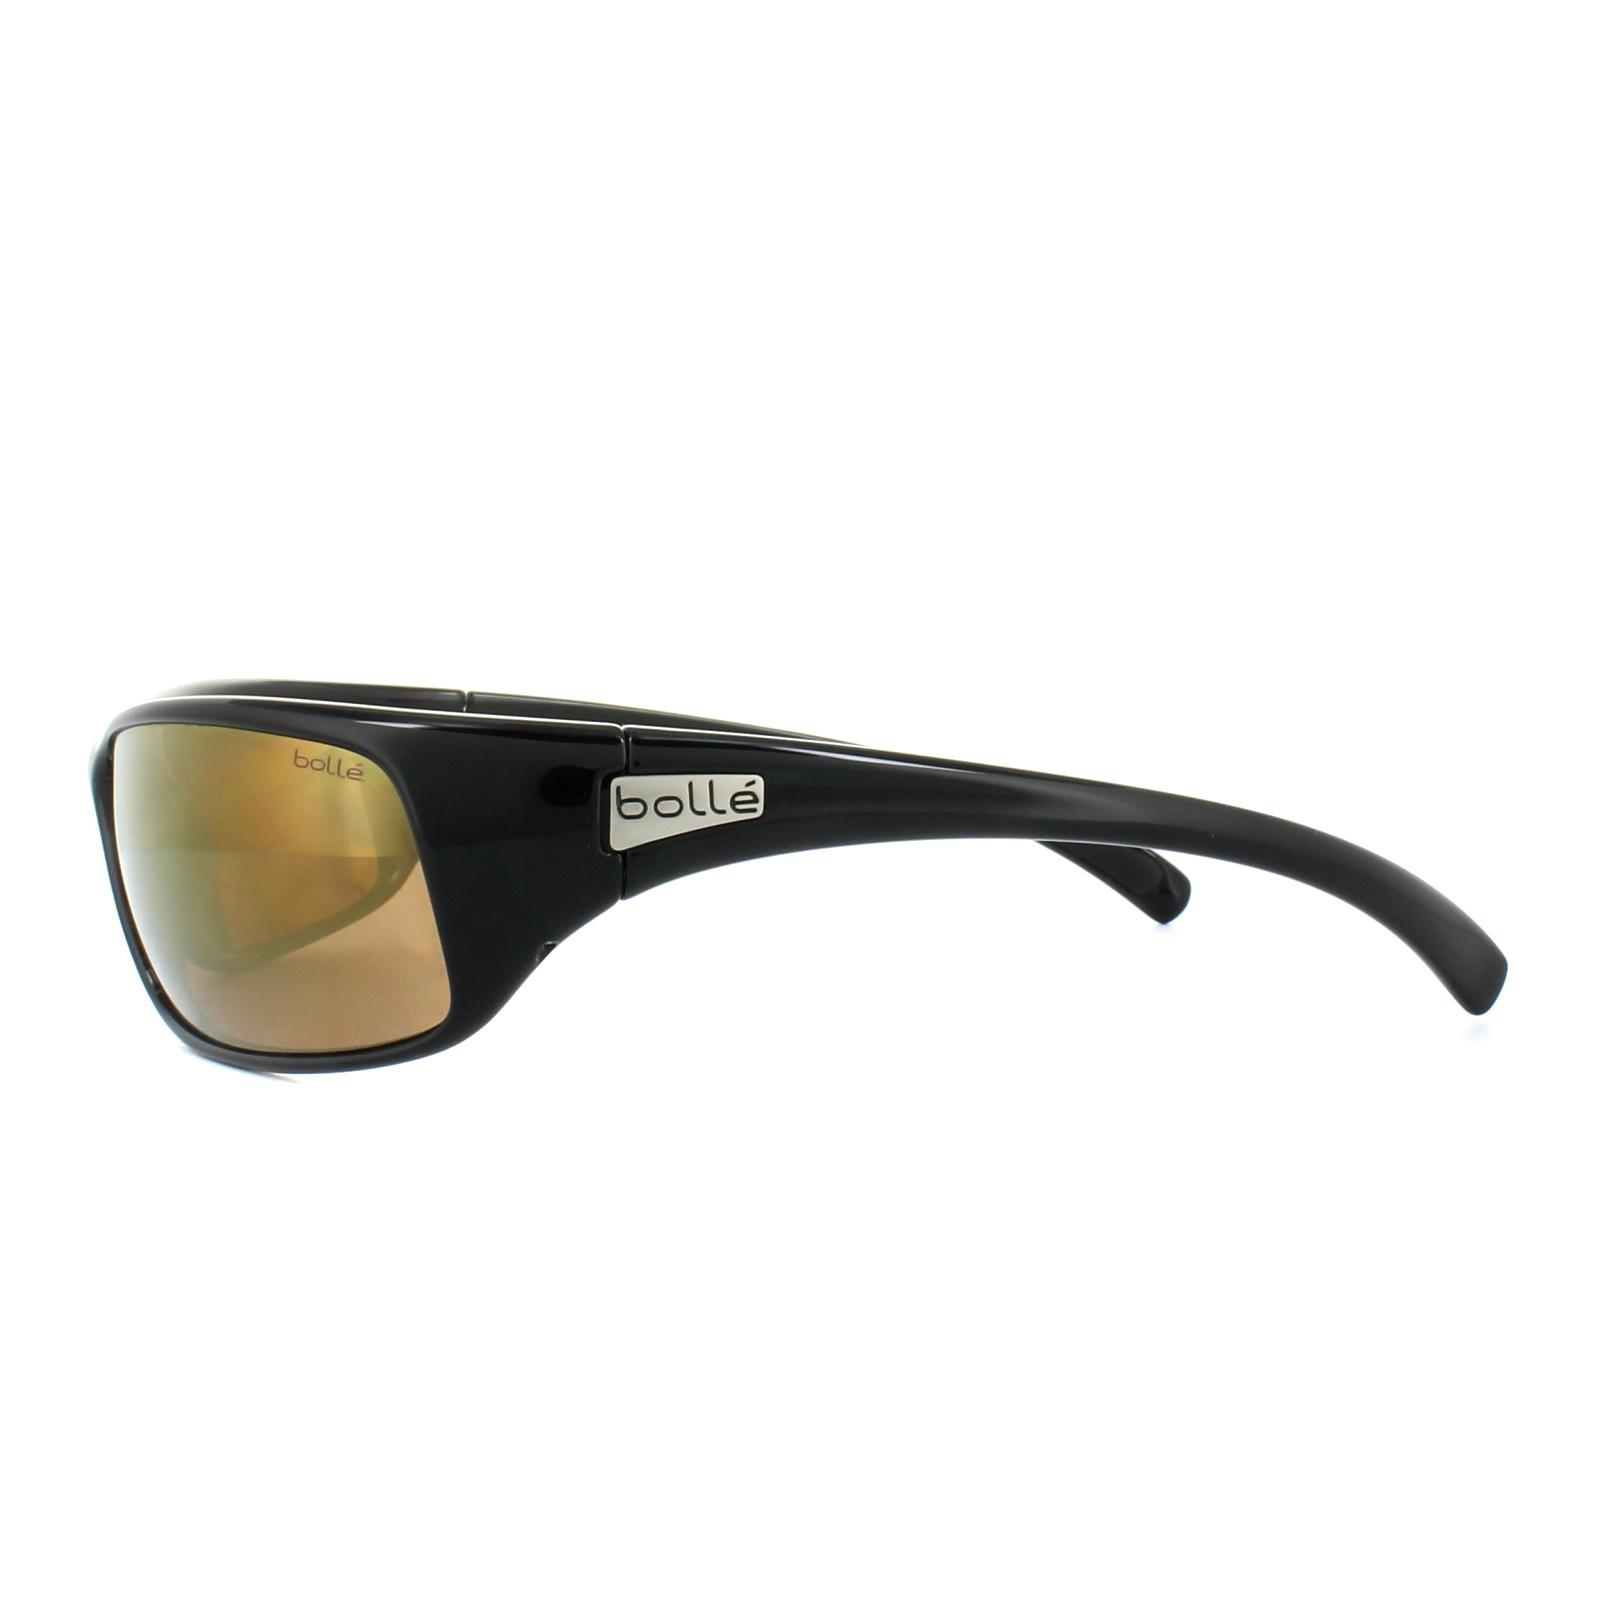 913d75e476 Bolle Sonnenbrille Recoil 11054 Glänzend Schwarz Inland Gold Polarisiert